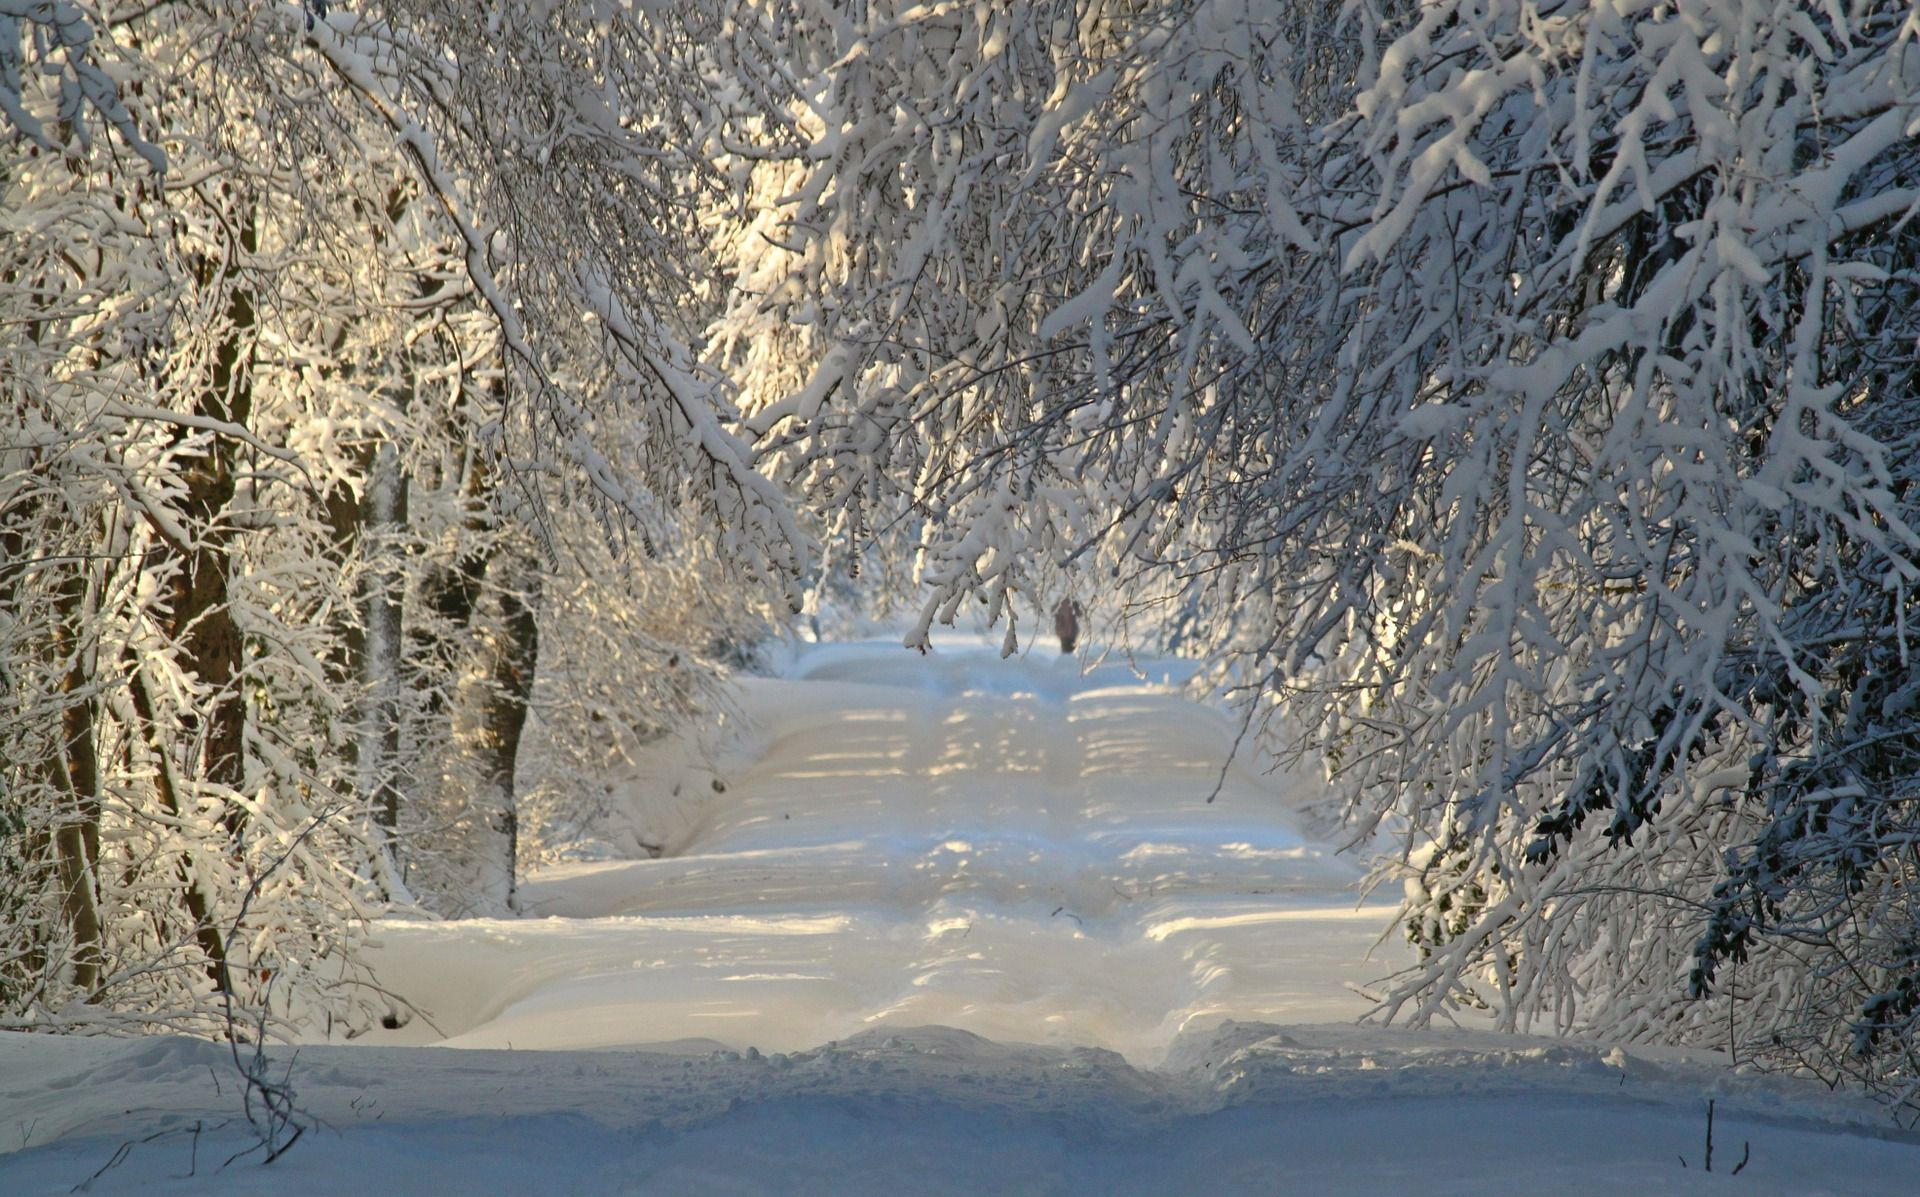 winter wonderland theme to inspire winter home decor